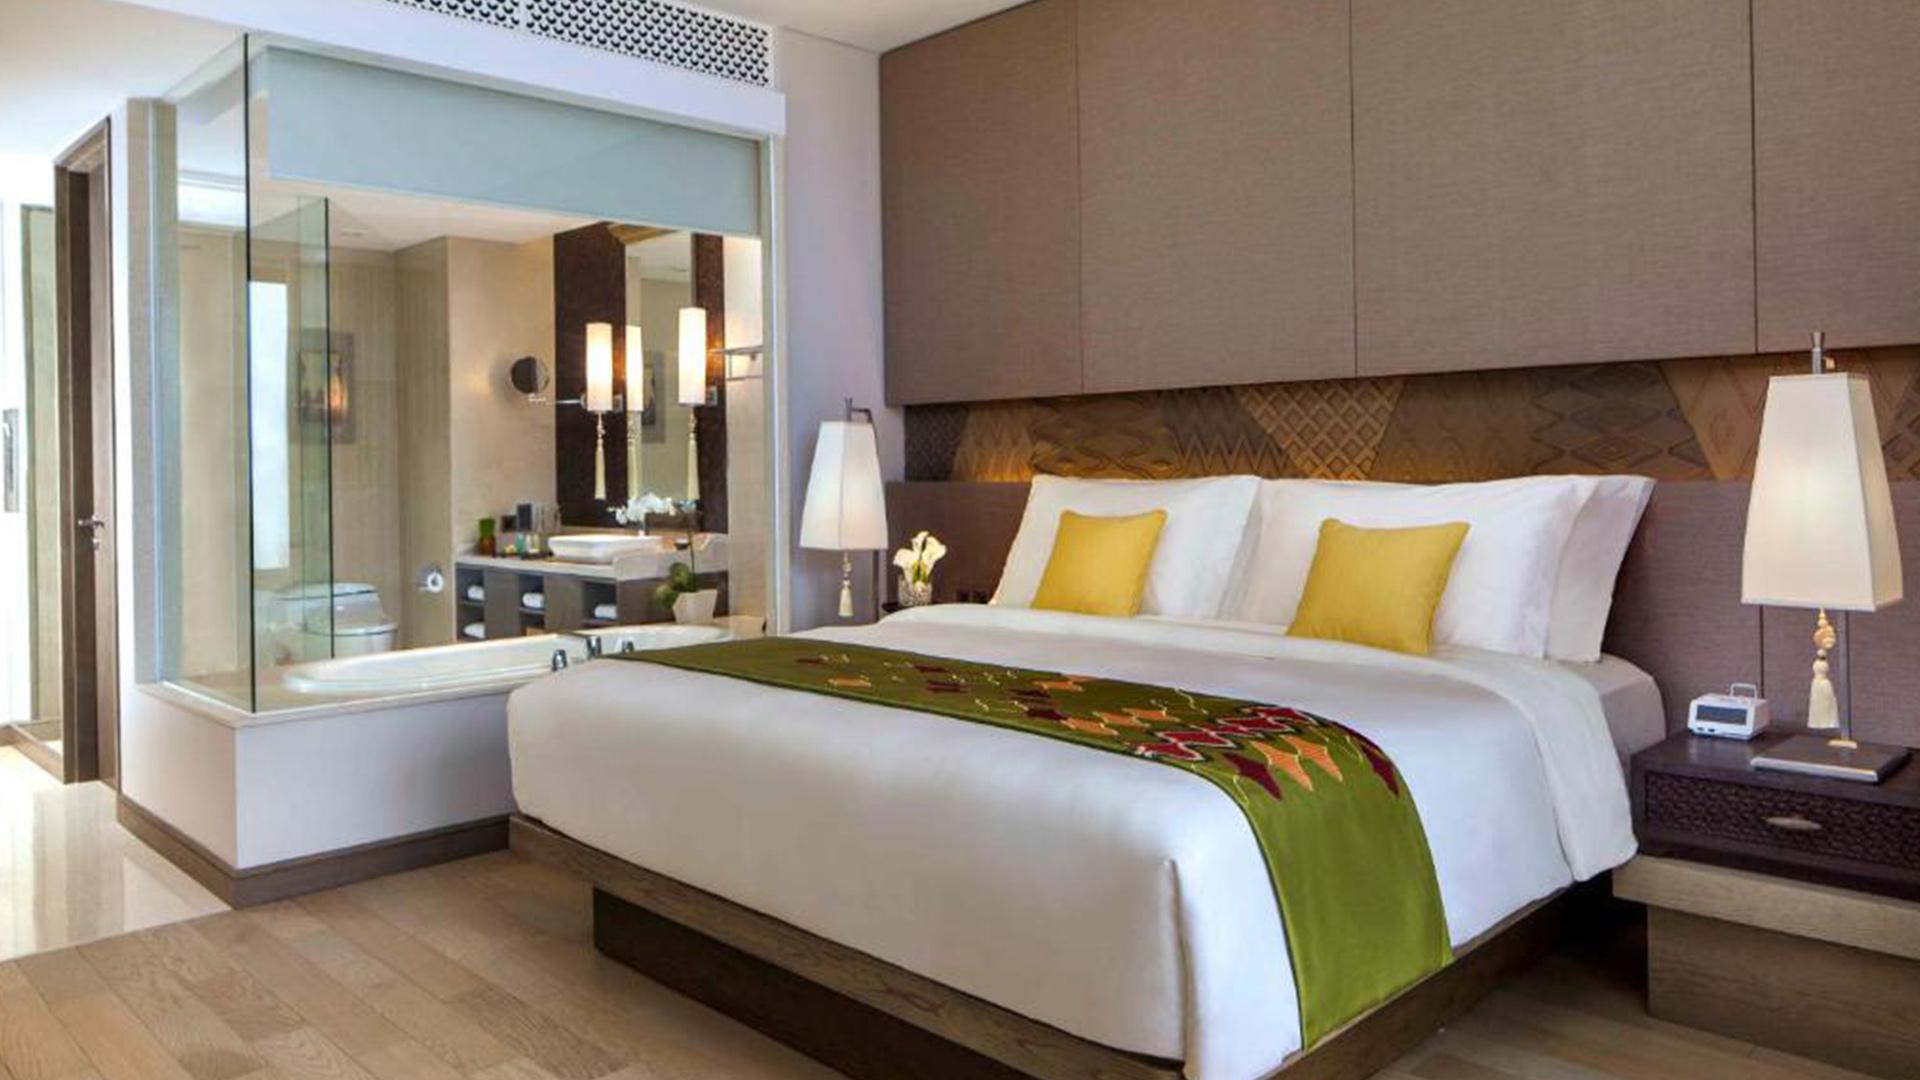 Classic Room image 1 at Mövenpick Resort & Spa Jimbaran Bali by Kabupaten Badung, Bali, Indonesia